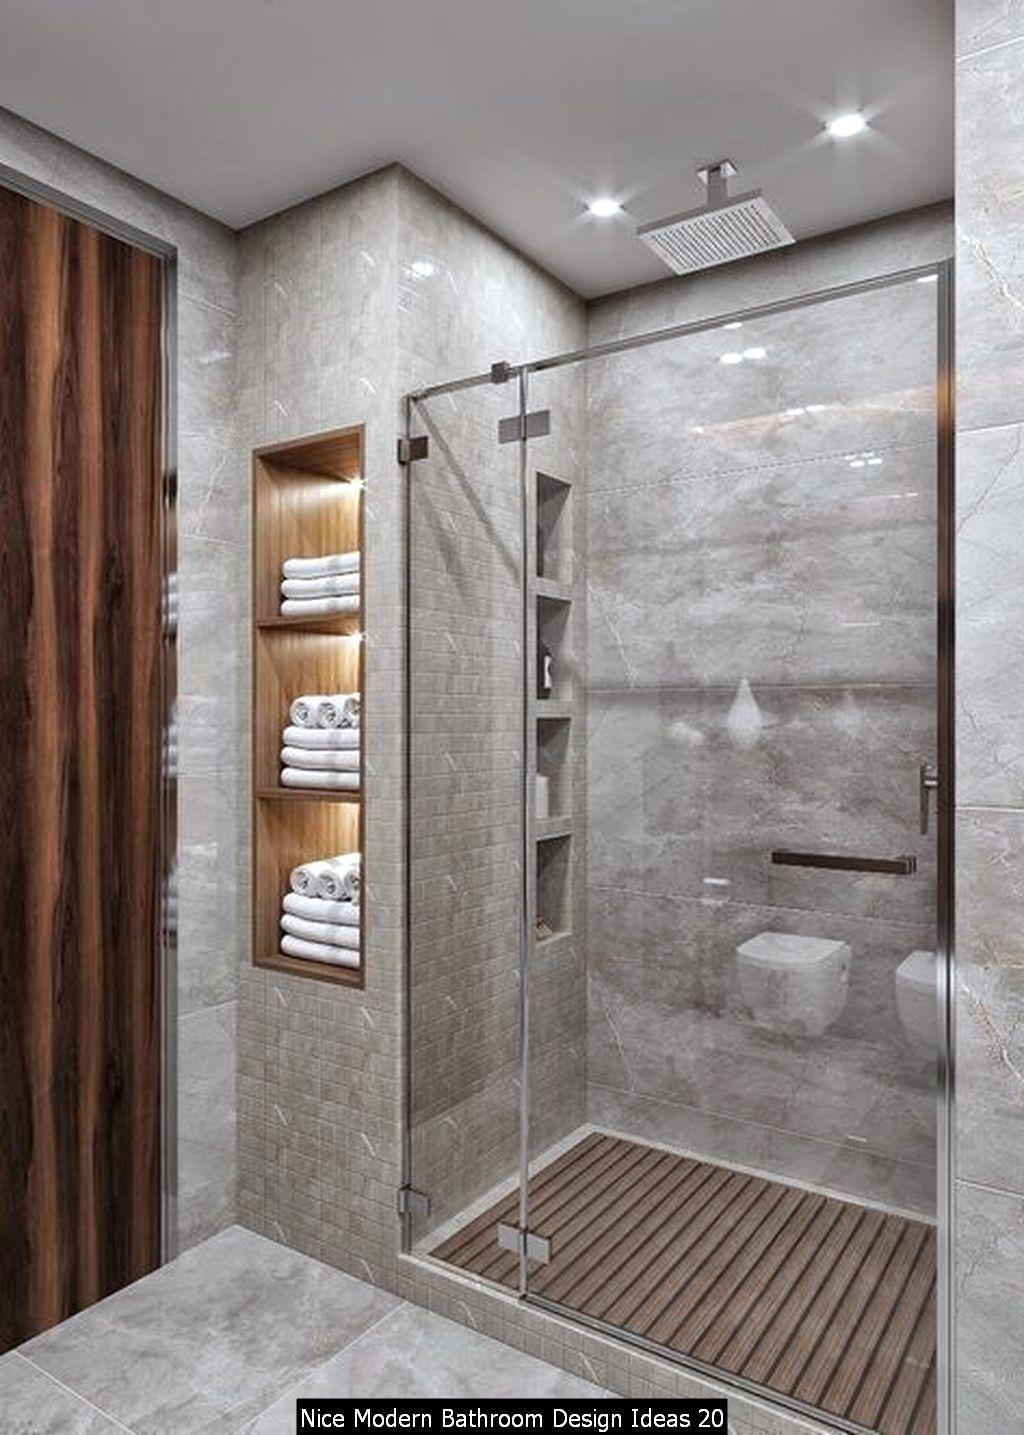 Nice Modern Bathroom Design Ideas In 2020 Small Bathroom Makeover Small Bathroom Remodel Bathrooms Remodel